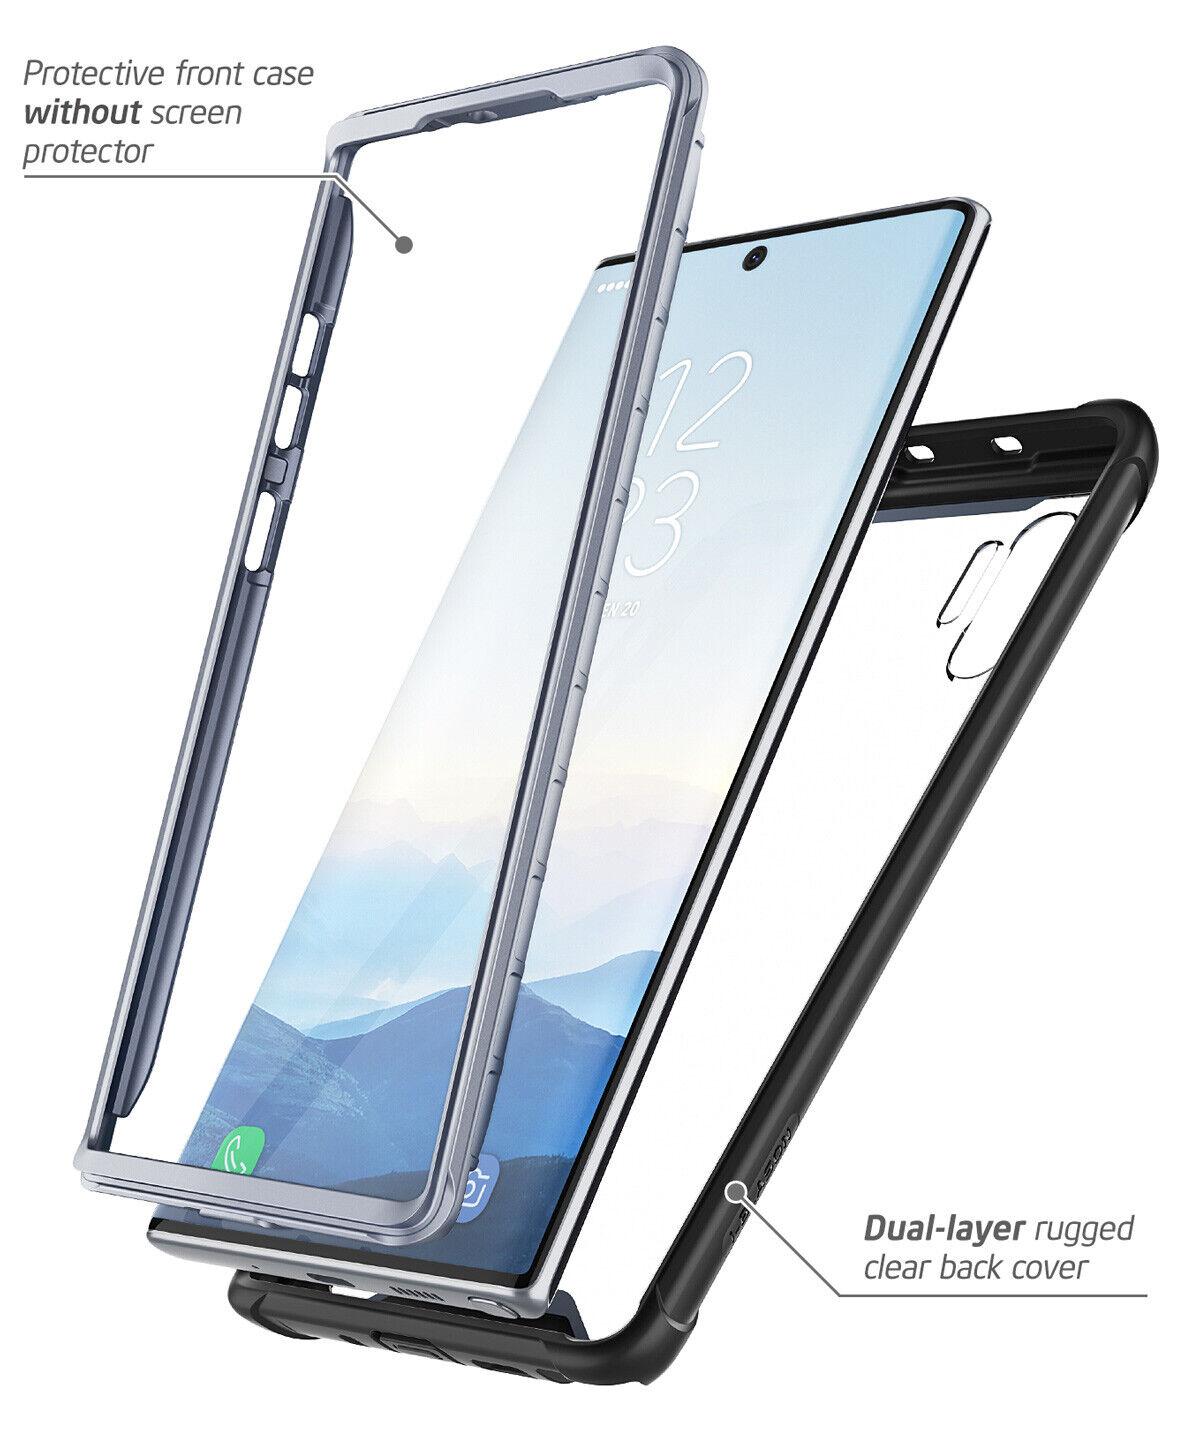 For Samsung Galaxy Note10+ Plus 5G, Genuine i-Blason Ares Cl